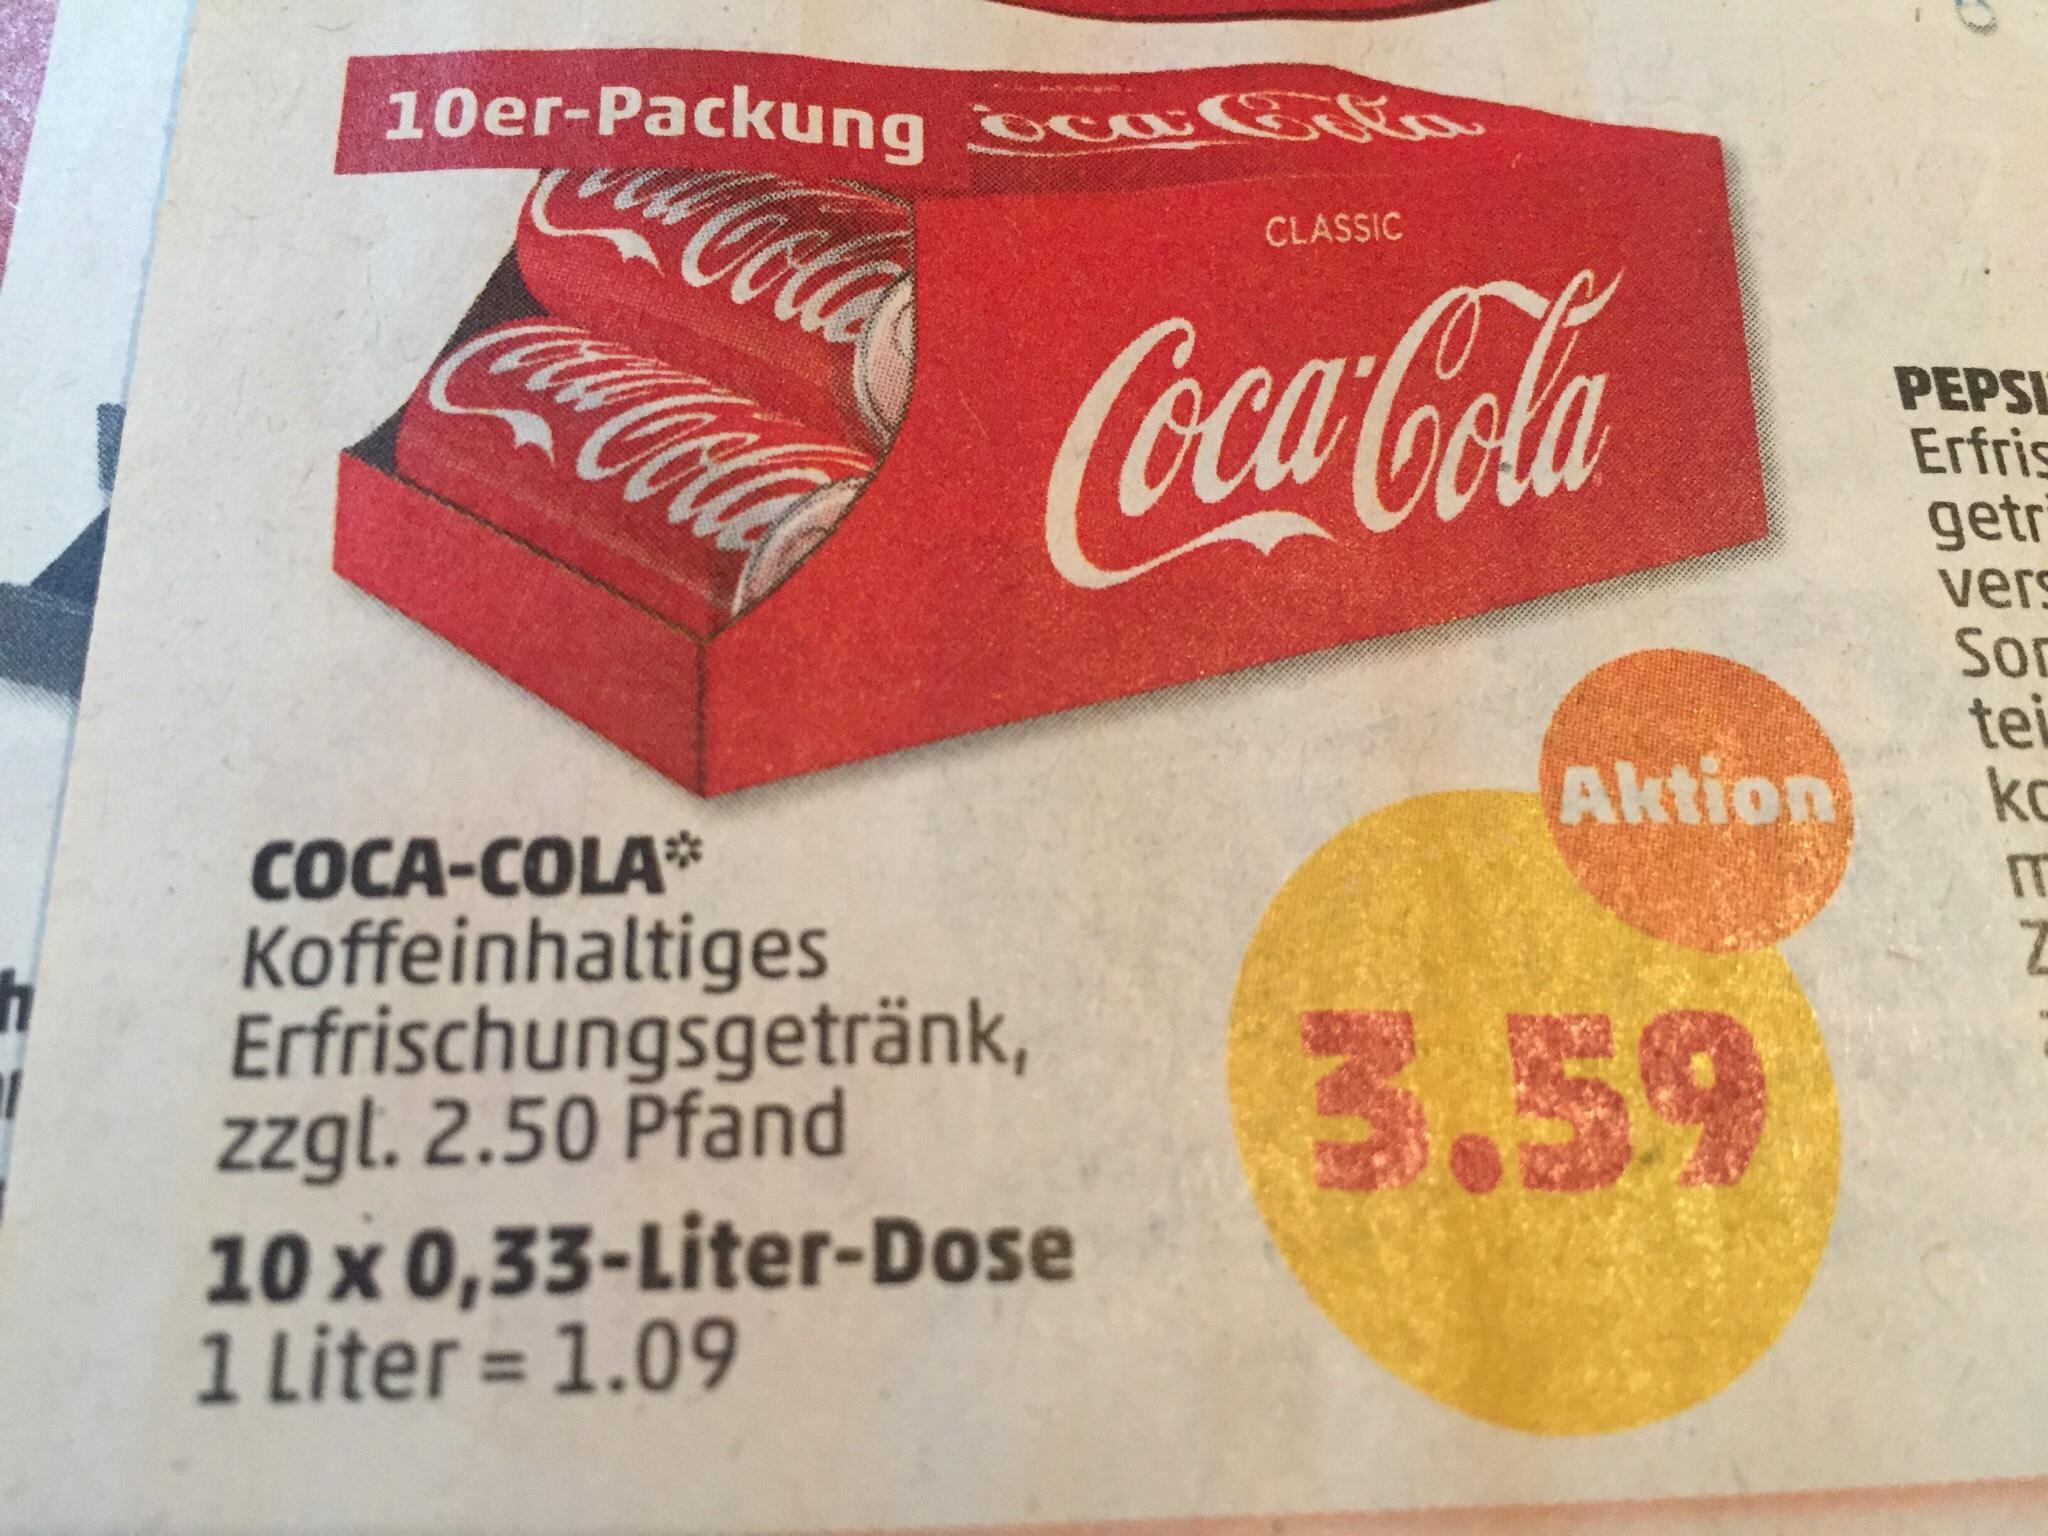 Coca Cola Friendspack ( 10x0,33L ) 3,59€(zzgl 2.50€ Pfand ) ab 03.04-07.04 bei Penny